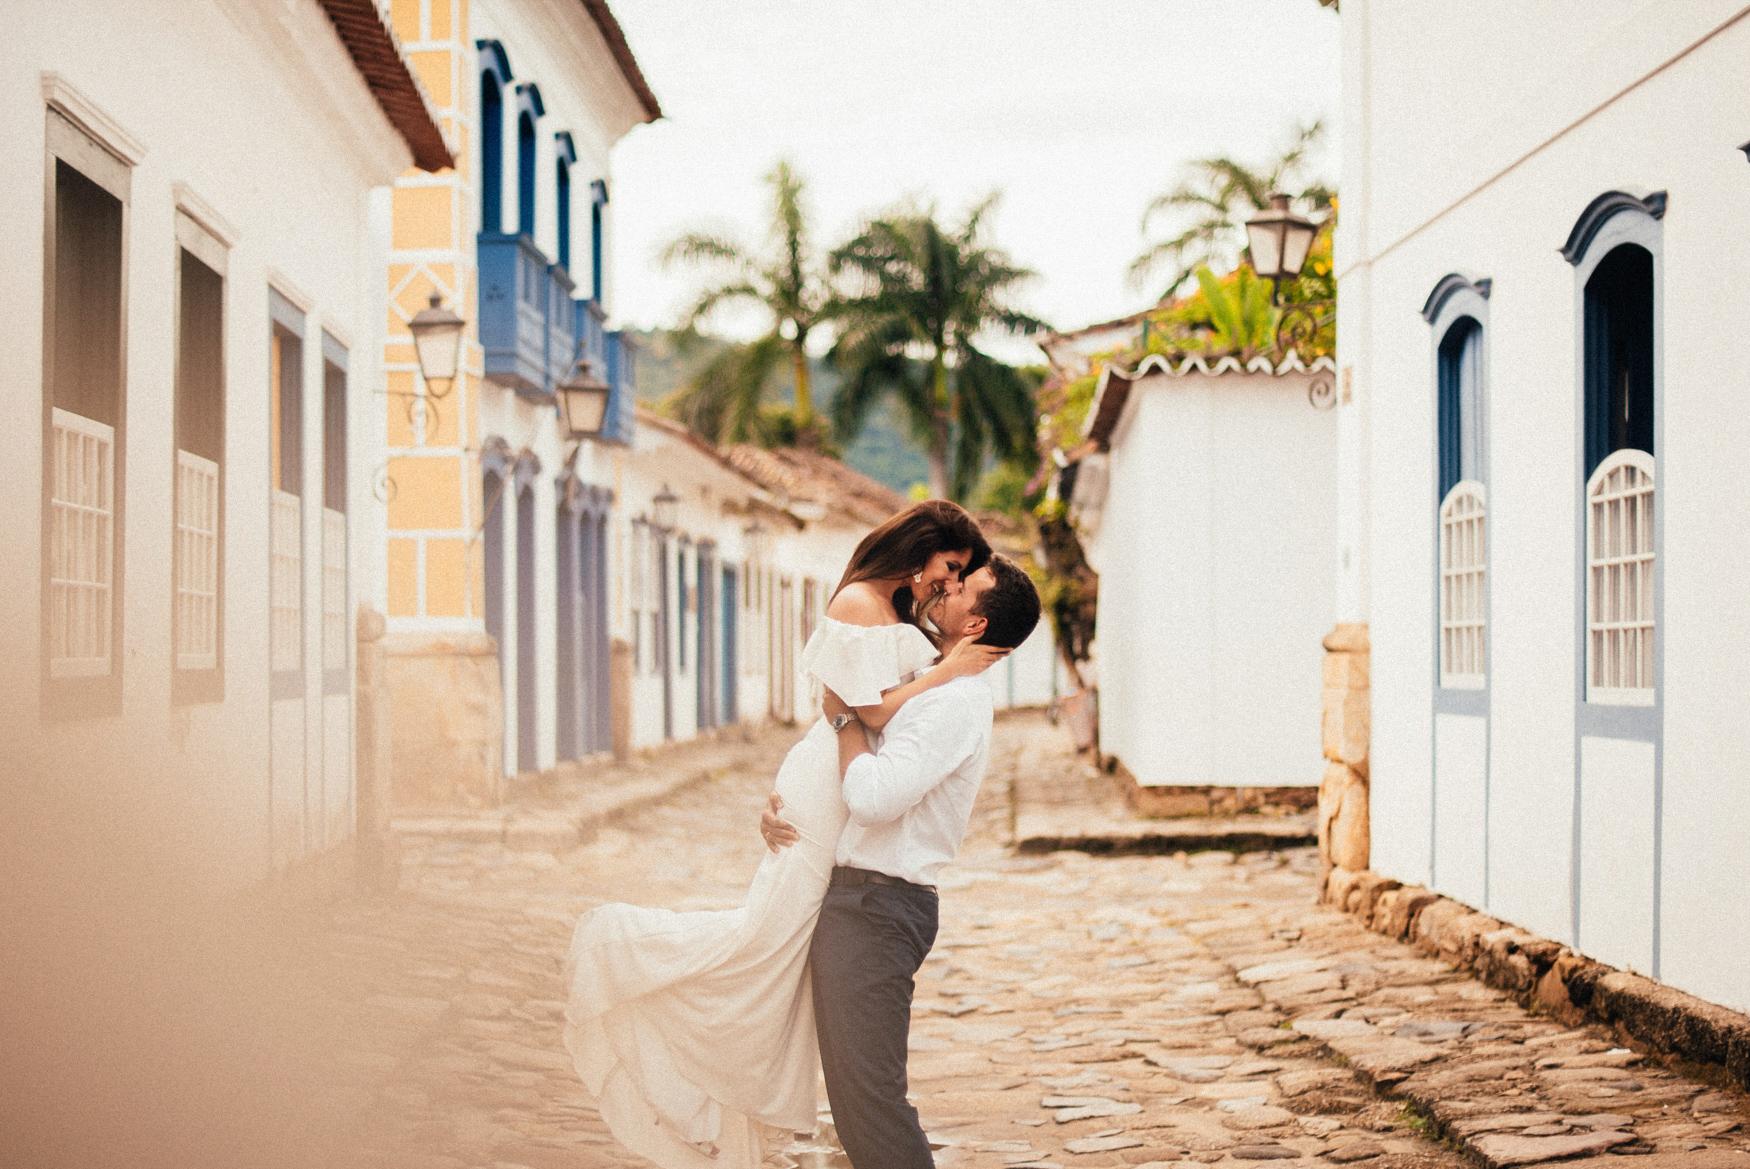 E&T2 brazil tropical elopement in paraty & rio 012.jpg